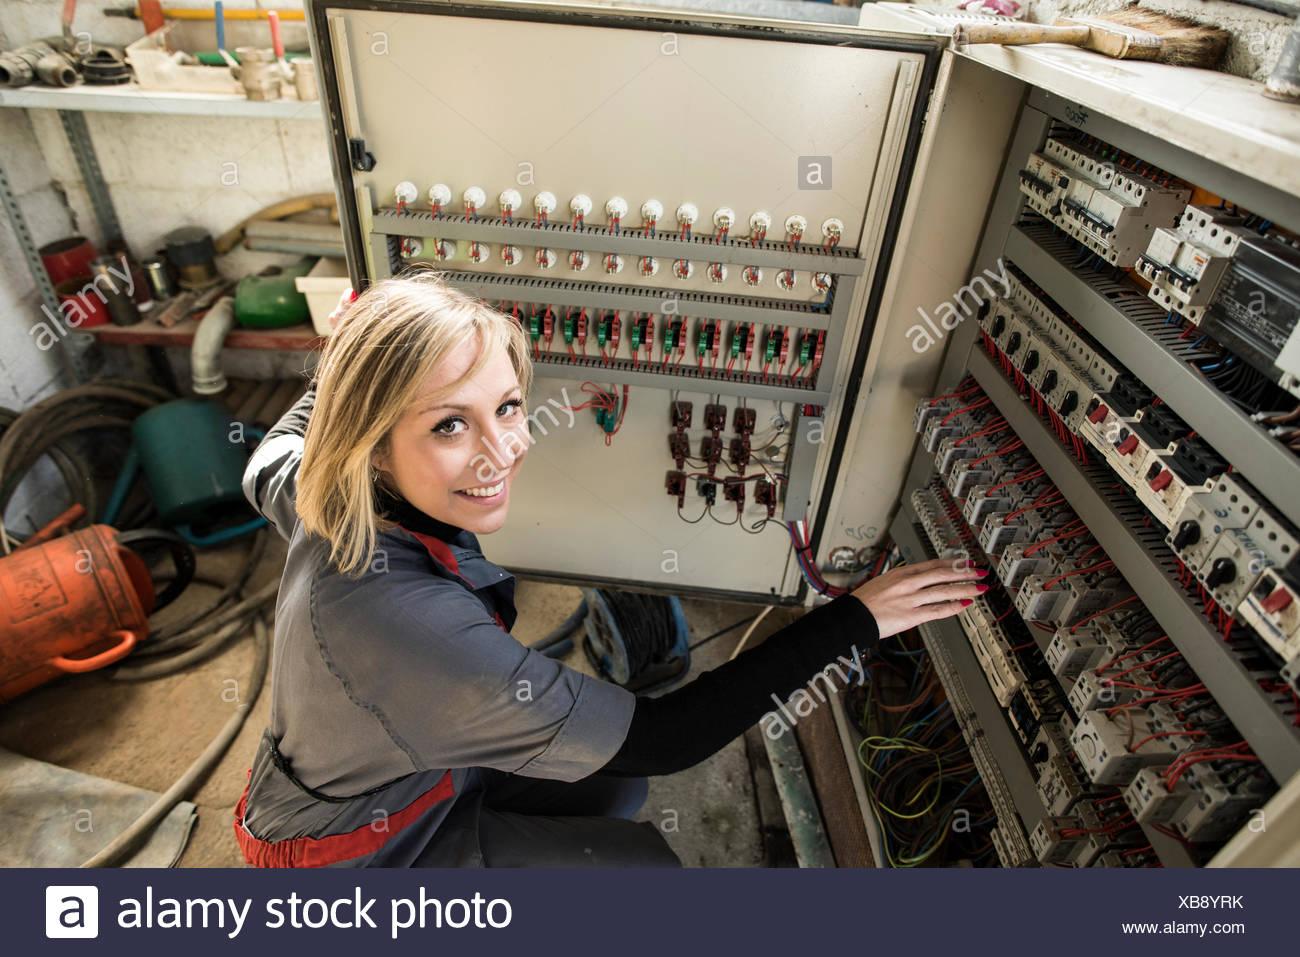 Woman checking fuse box - Stock Image